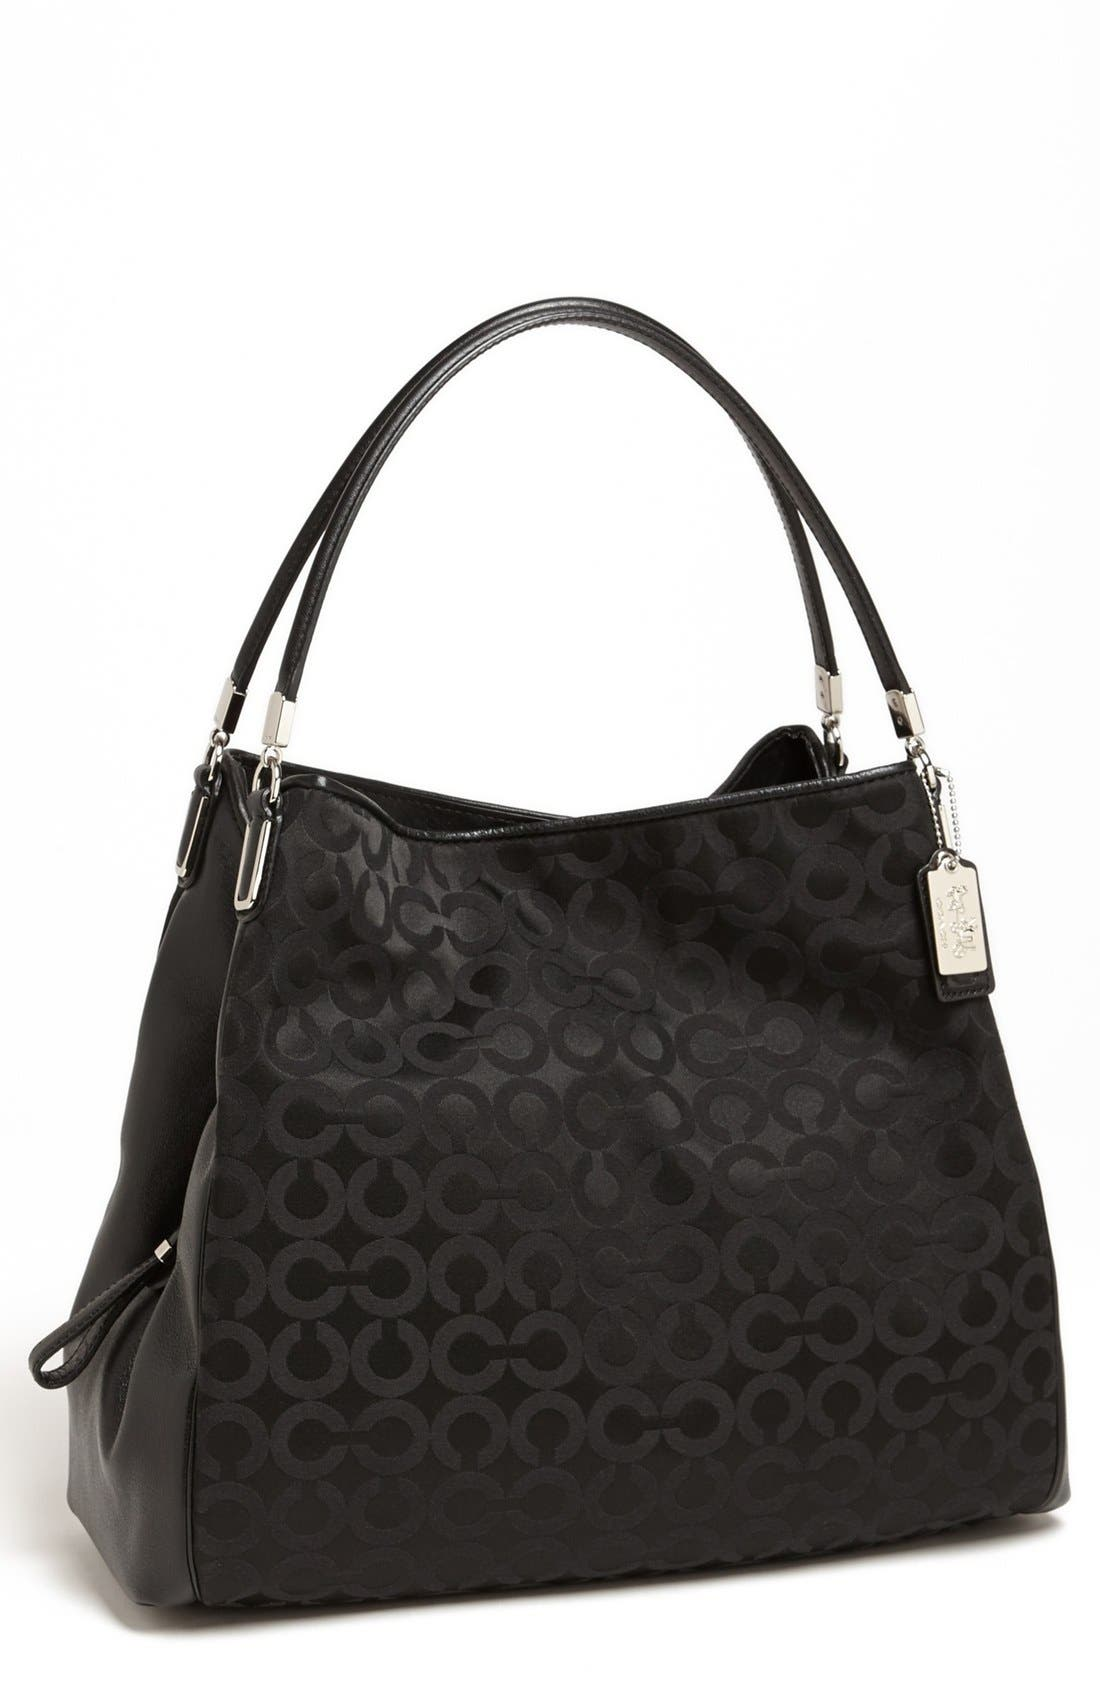 Alternate Image 1 Selected - COACH 'Madison - Phoebe' Leather Shoulder Bag